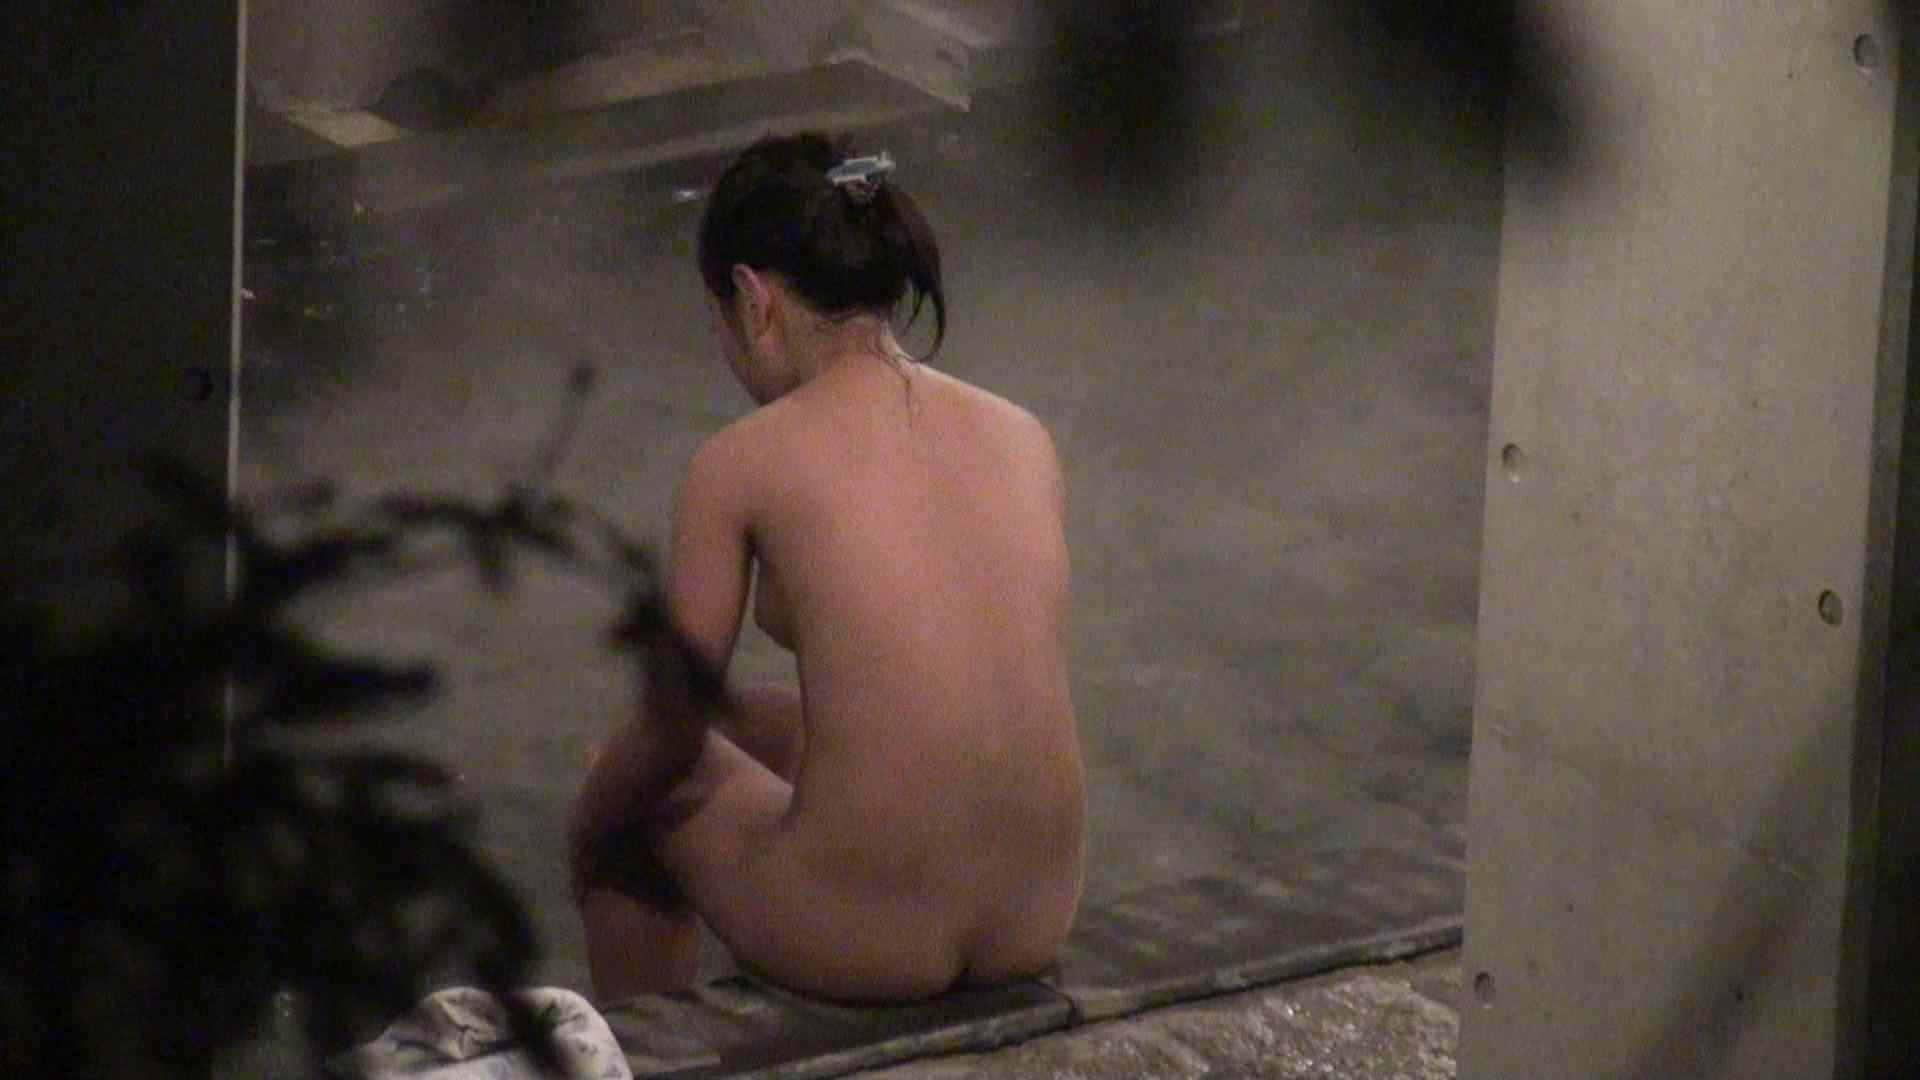 Aquaな露天風呂Vol.407 0   0  88連発 69